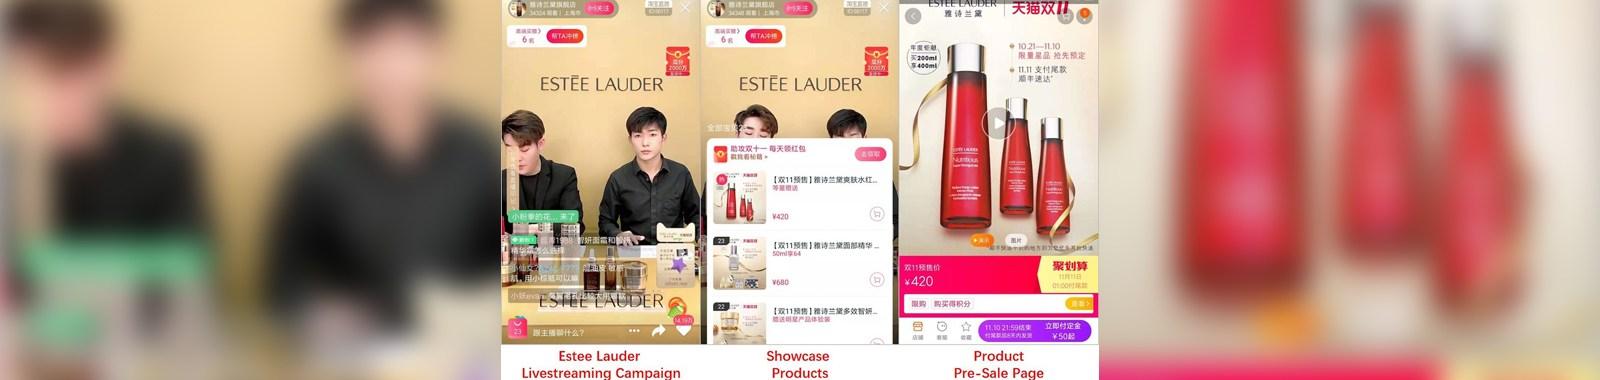 Taobao-ESTEE-LAUDER-Livestreaming-singles-day-2019-eye